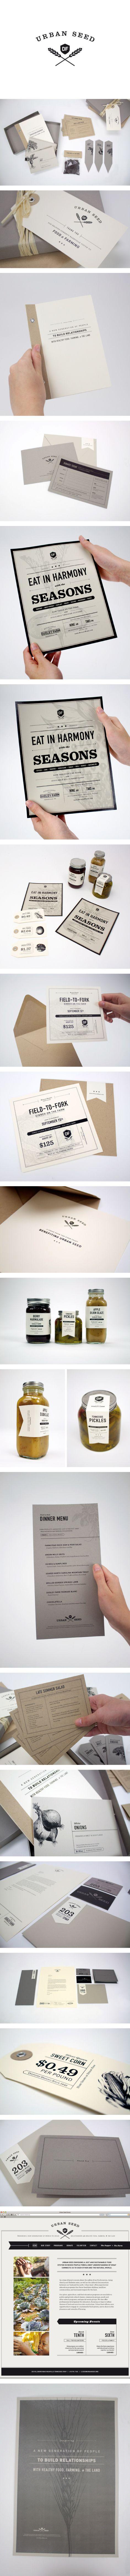 URBAN SEED_CAROLINE MORRIS...this branding is wonderful....especially the last poster